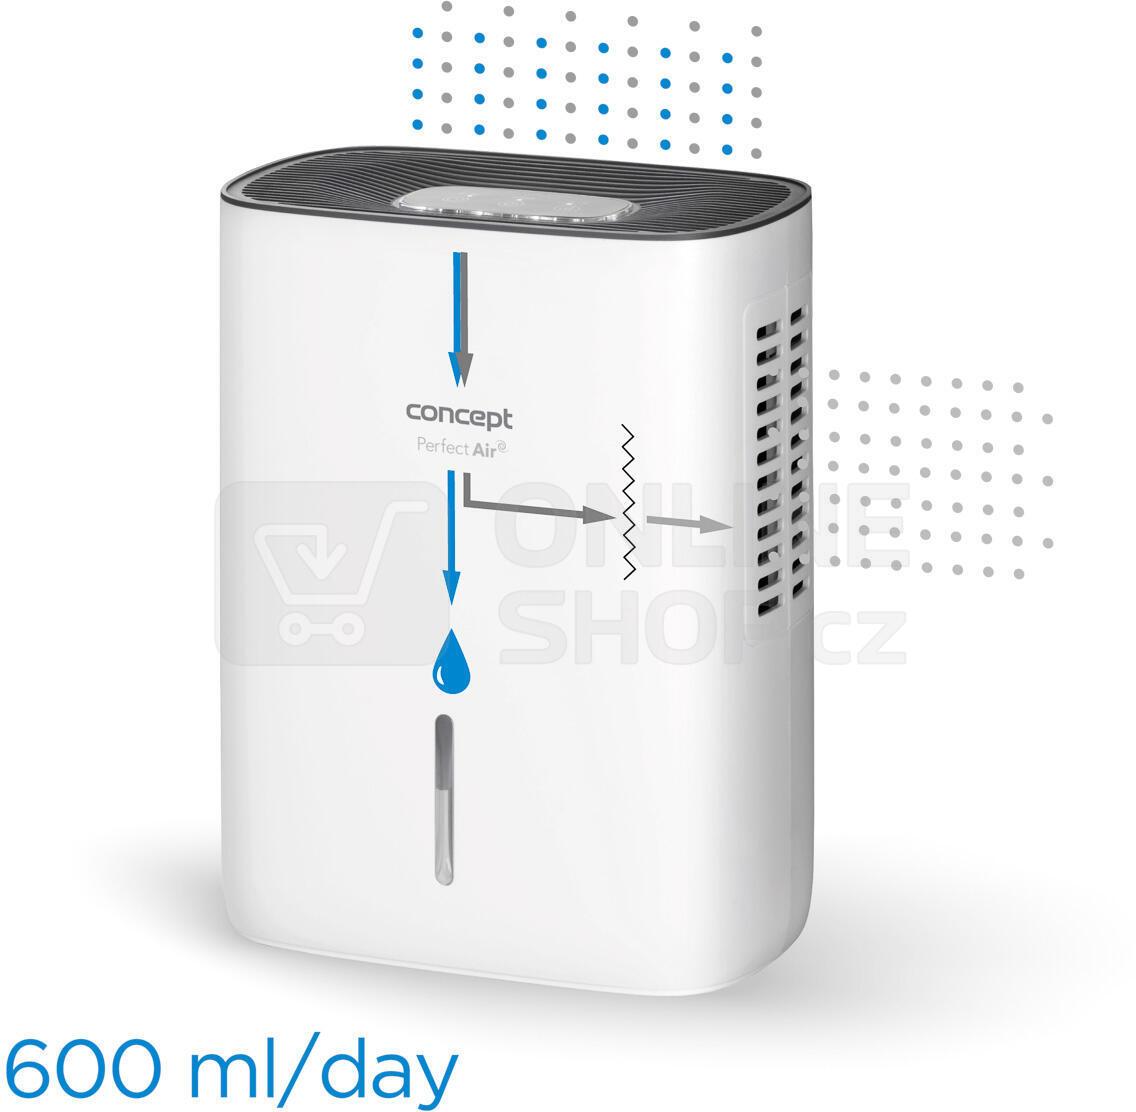 Odvlhčovač vzduchu Concept OV1000 Perfect Air